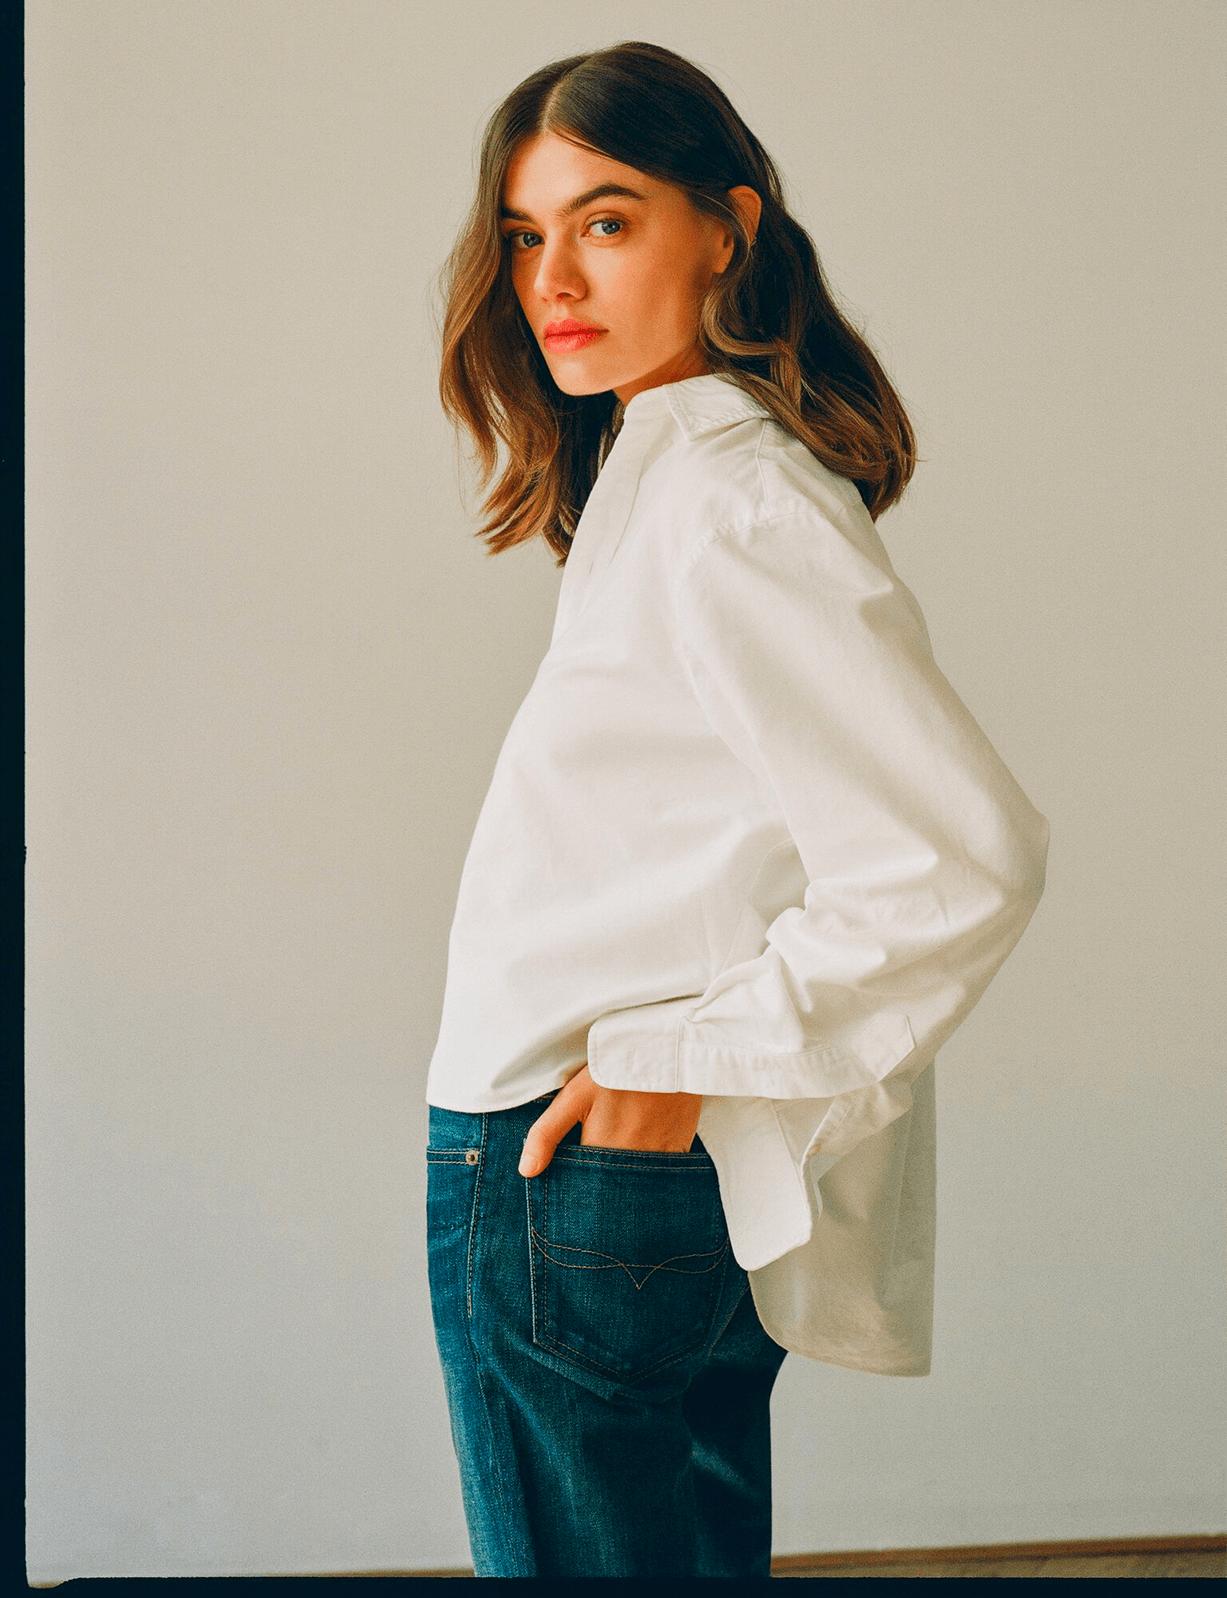 Joanna Halpin modeling